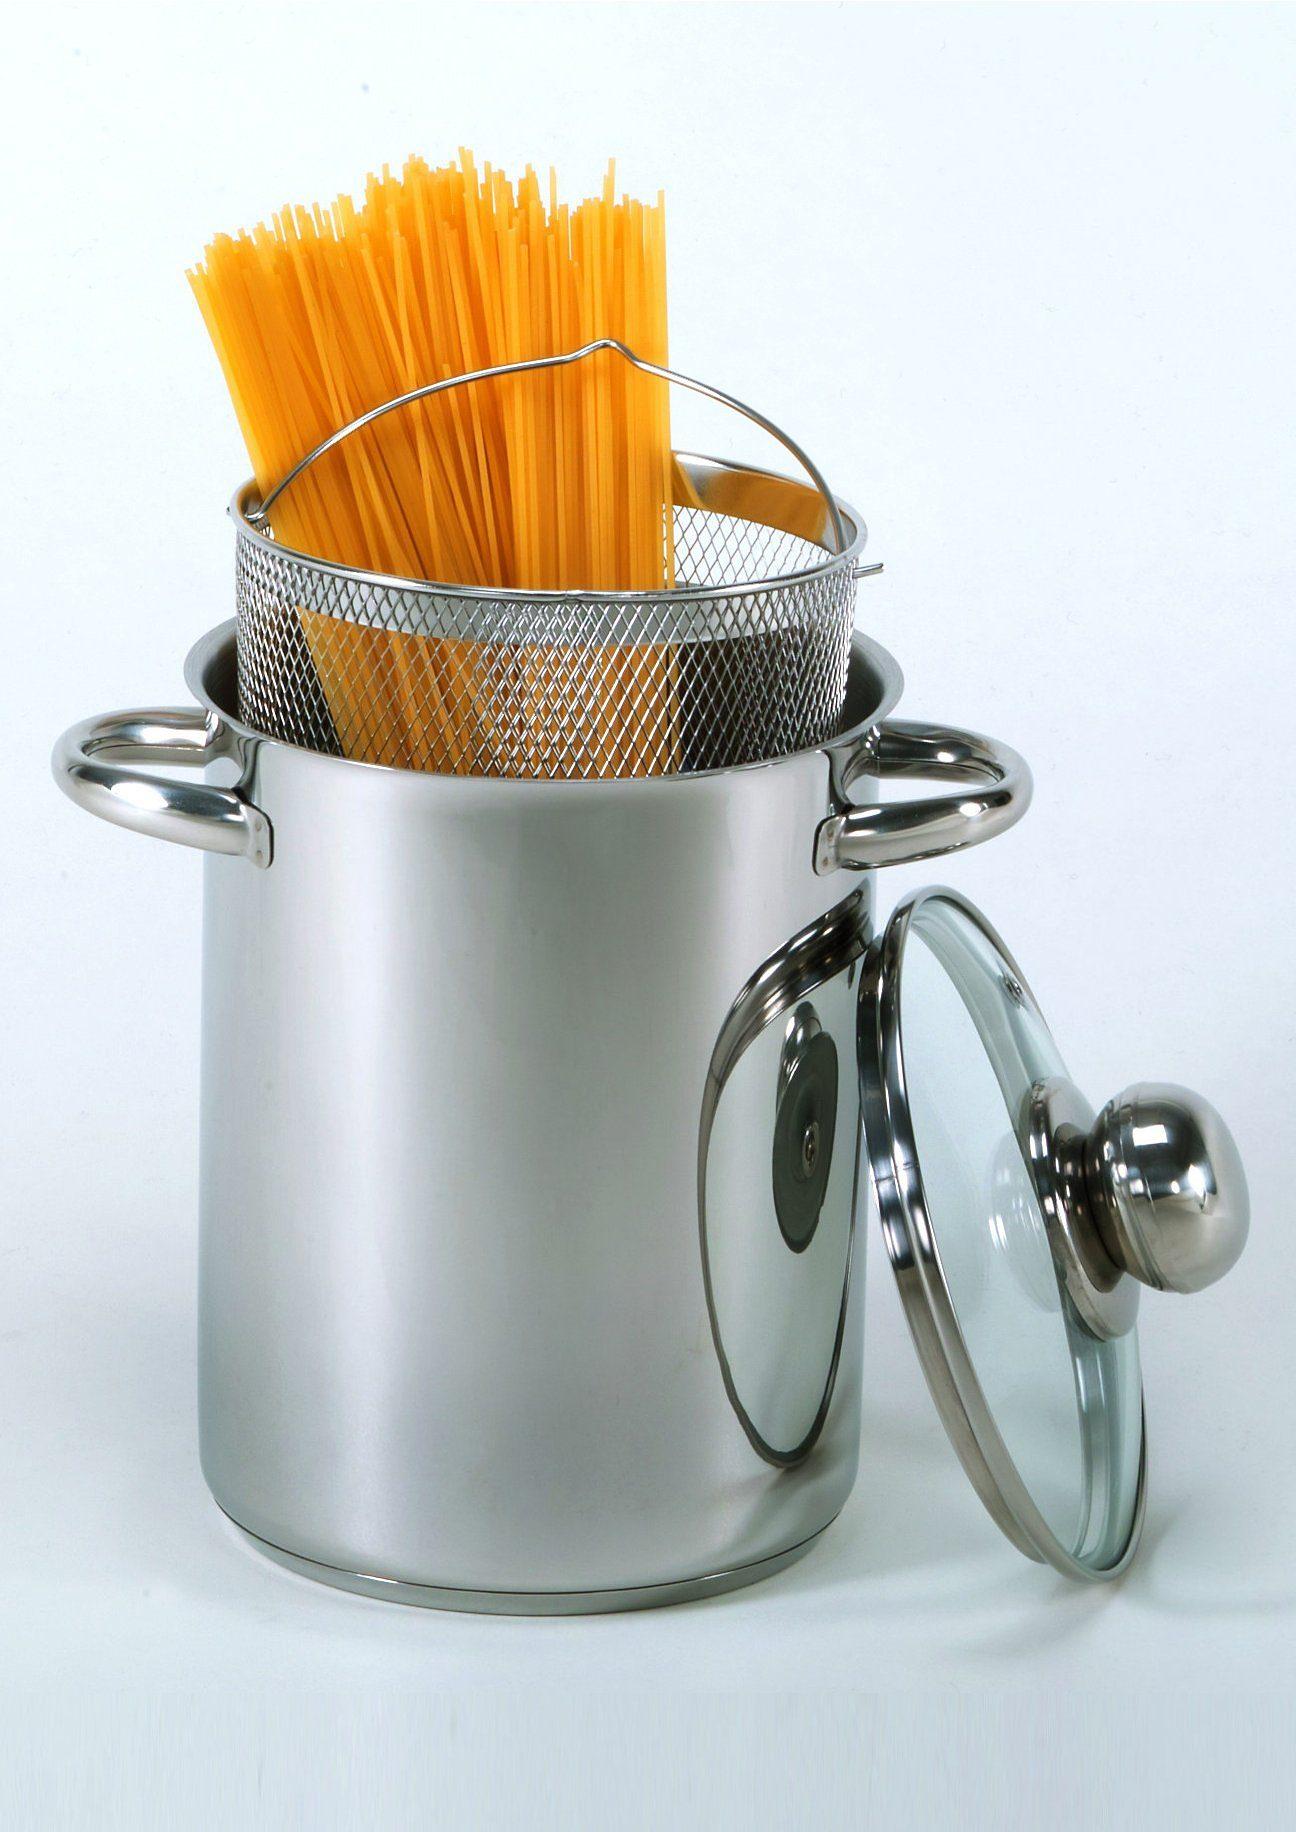 Krüger Spargeltopf, Edelstahl, (1 tlg.) silberfarben Spargeltopf Spaghettitöpfe Töpfe Haushaltswaren